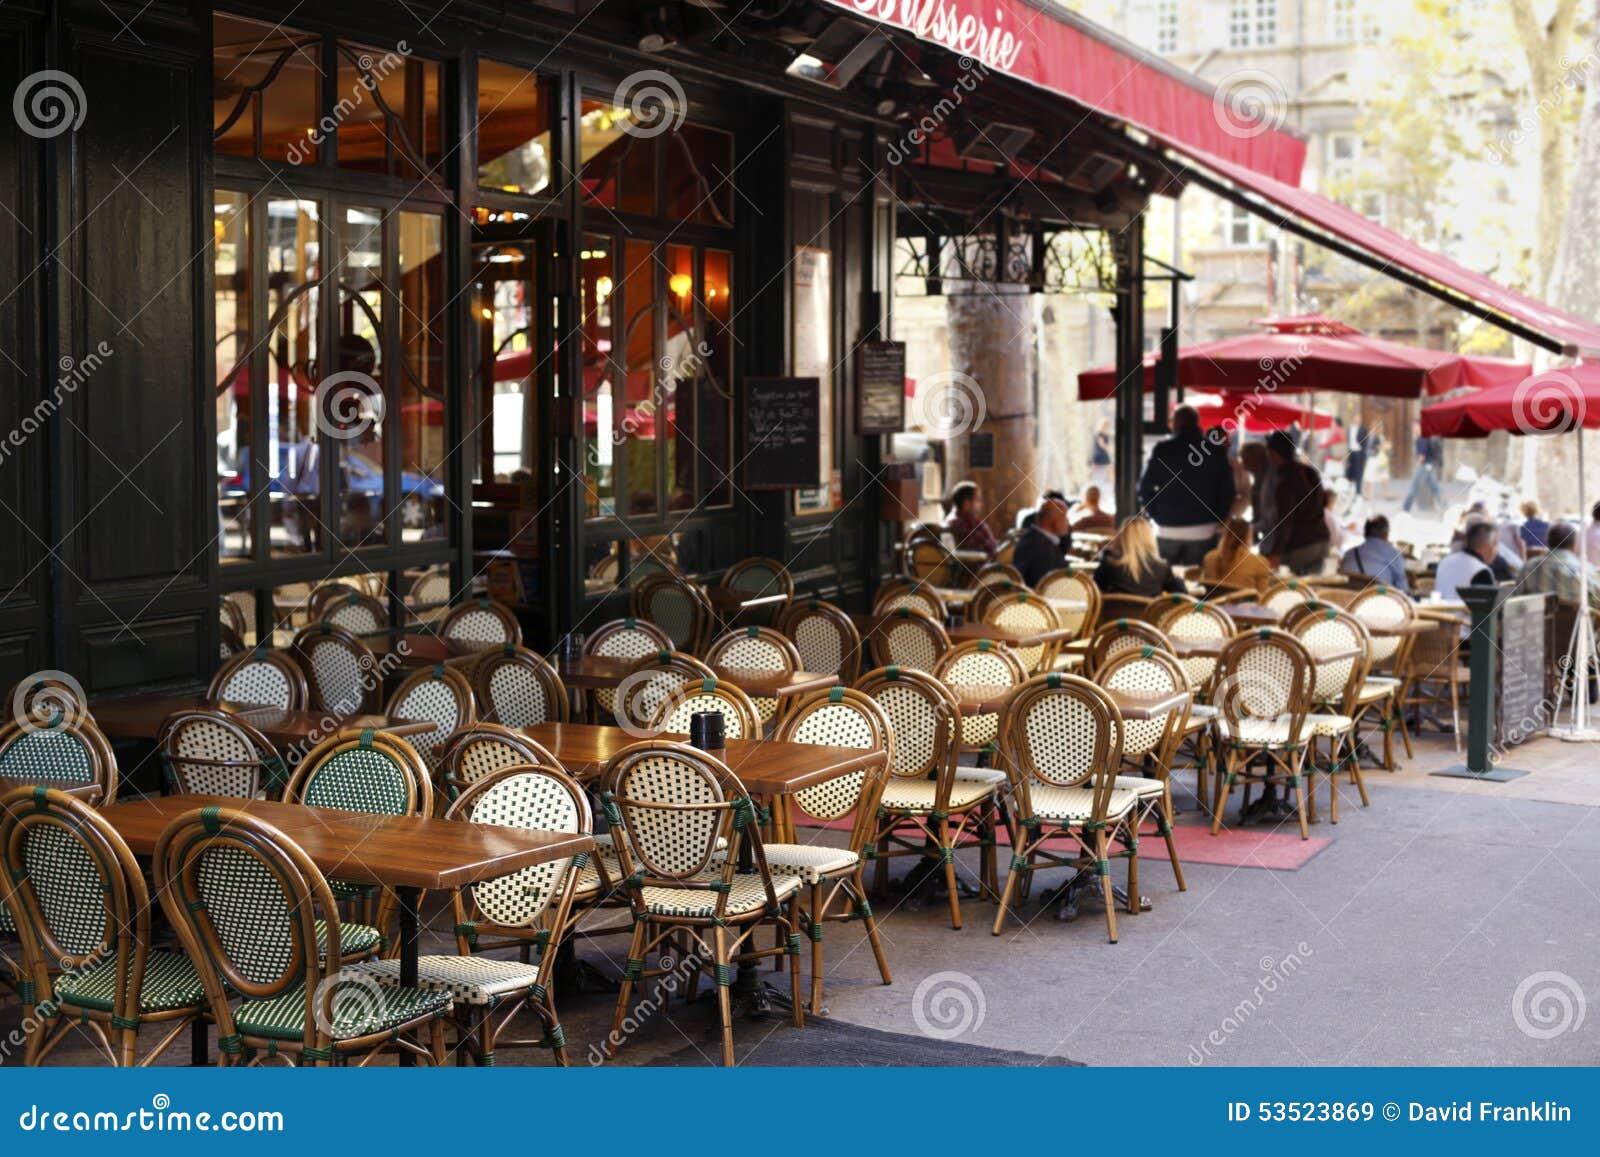 French Restaurant Sidewalk Cafe Paris France Stock Image